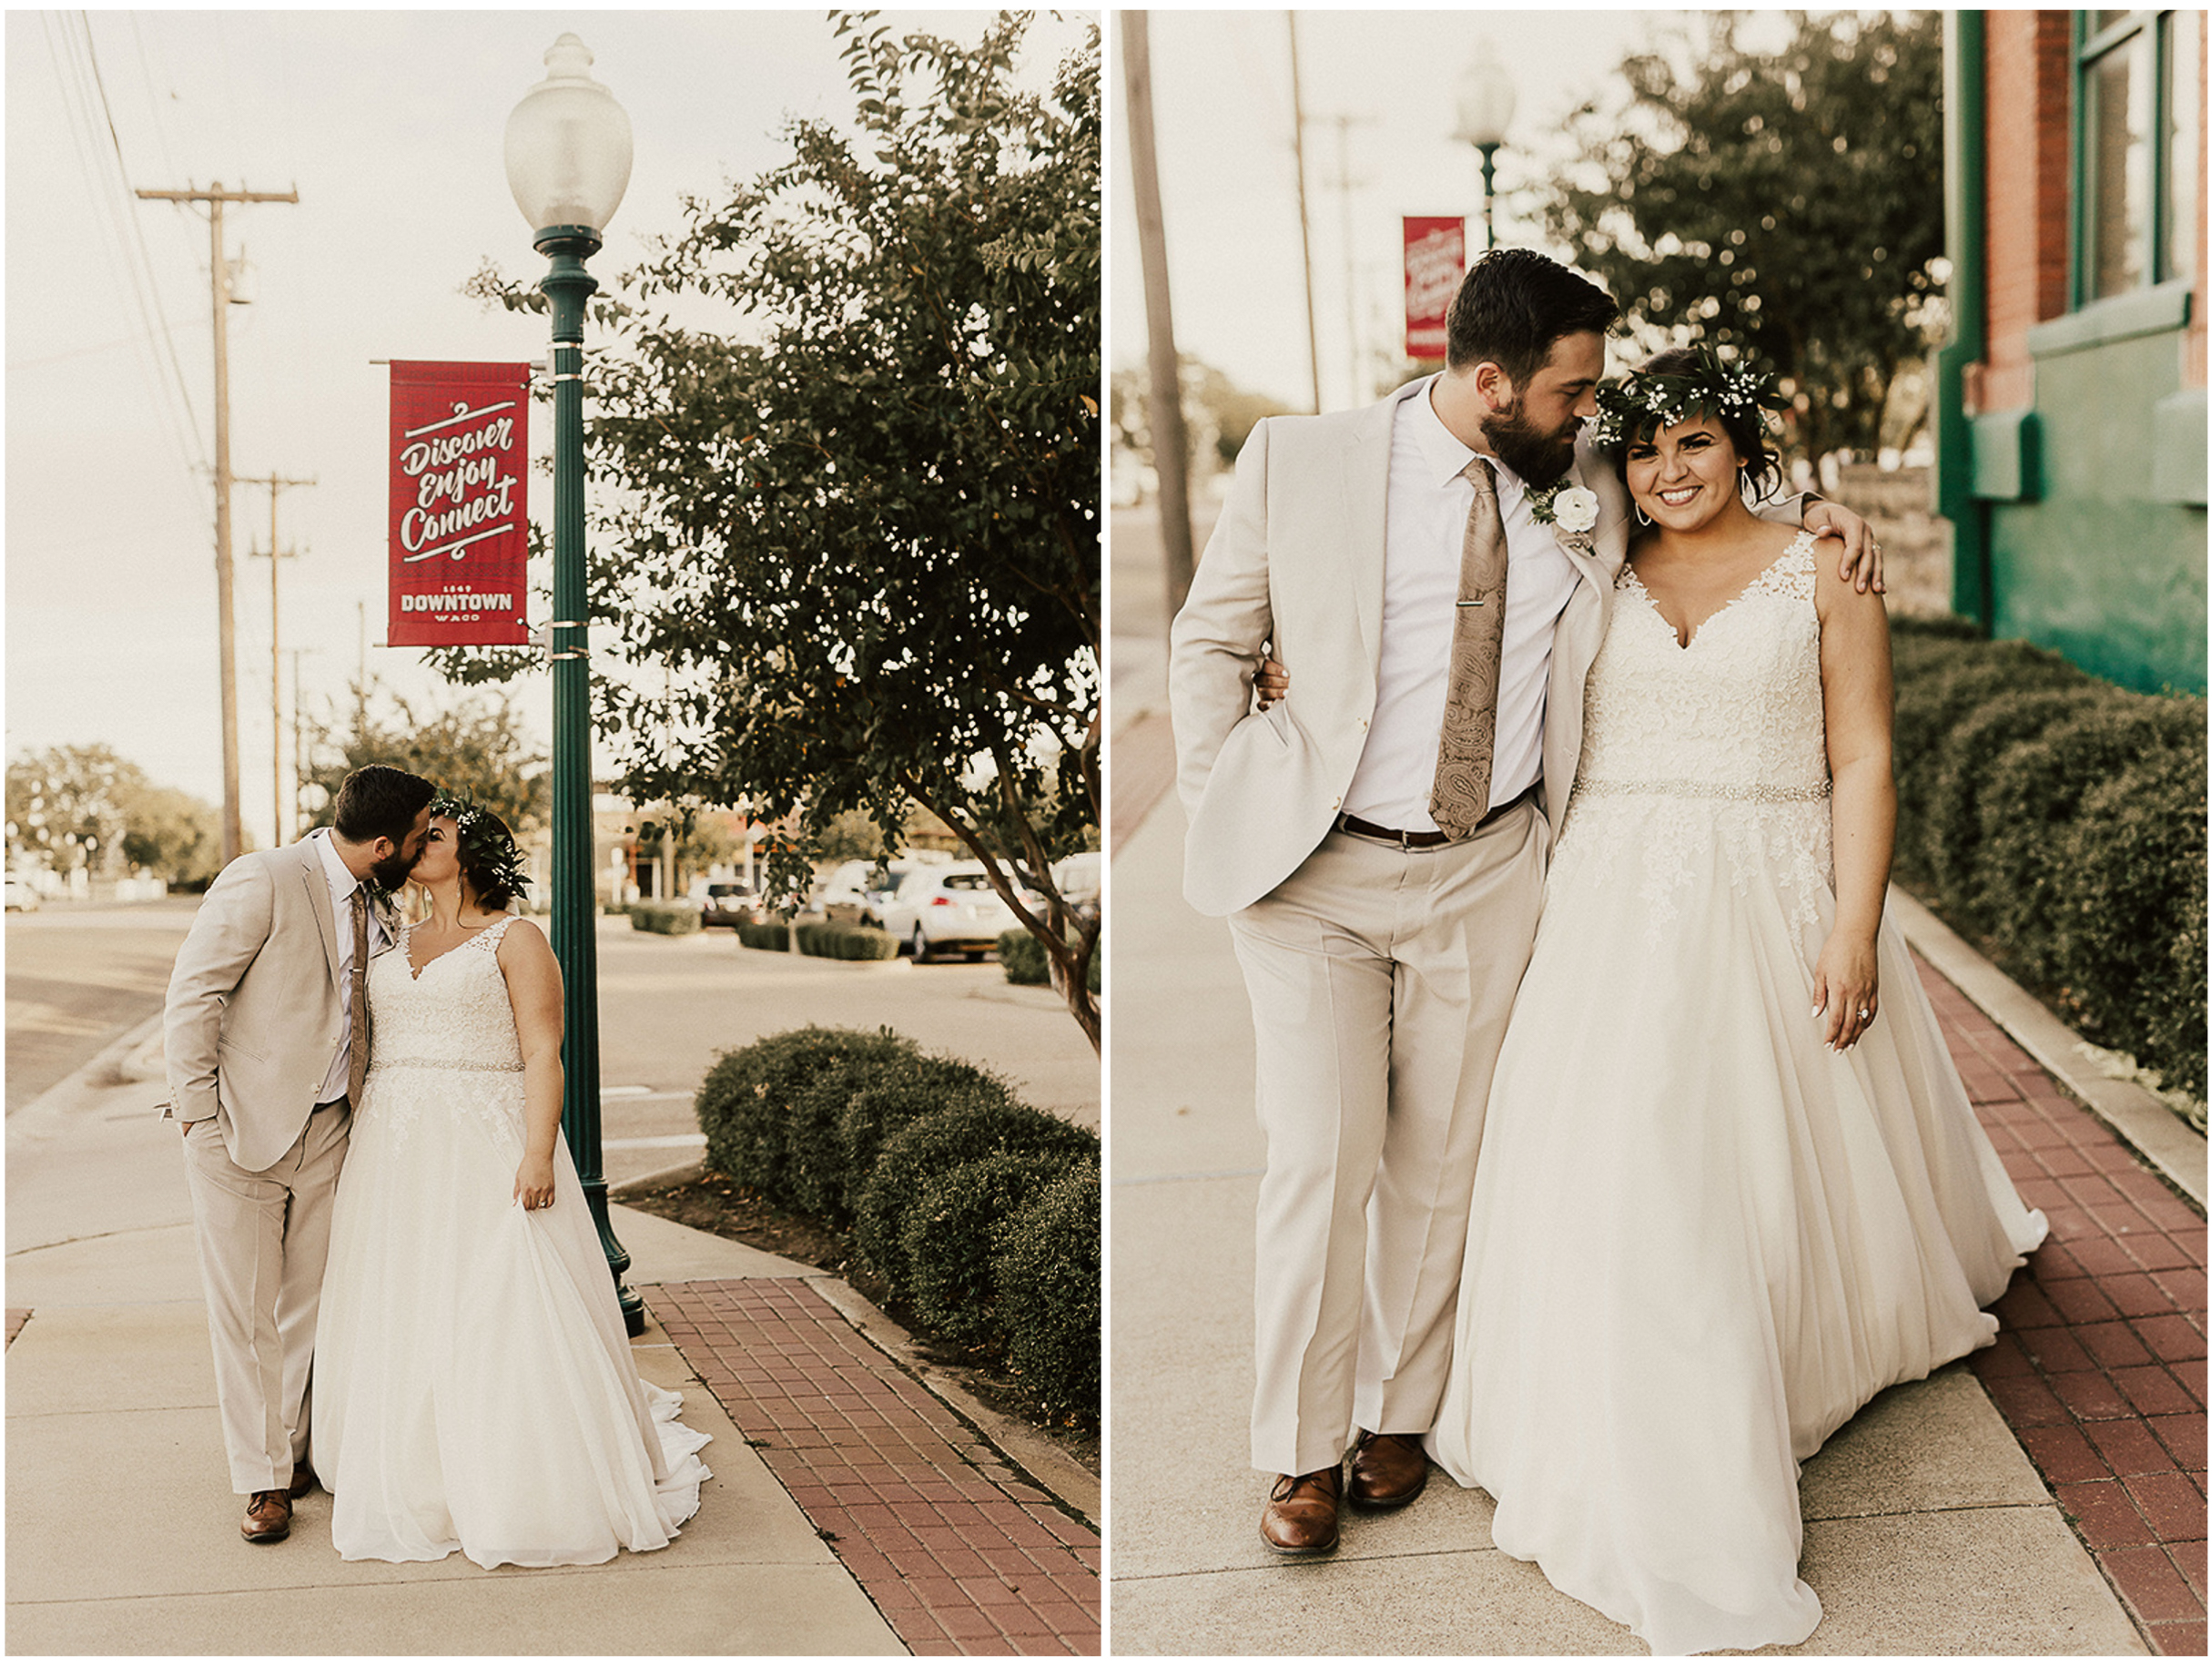 morgan-ben-the-phoenix-waco-texas-wedding-photographer-10.jpg